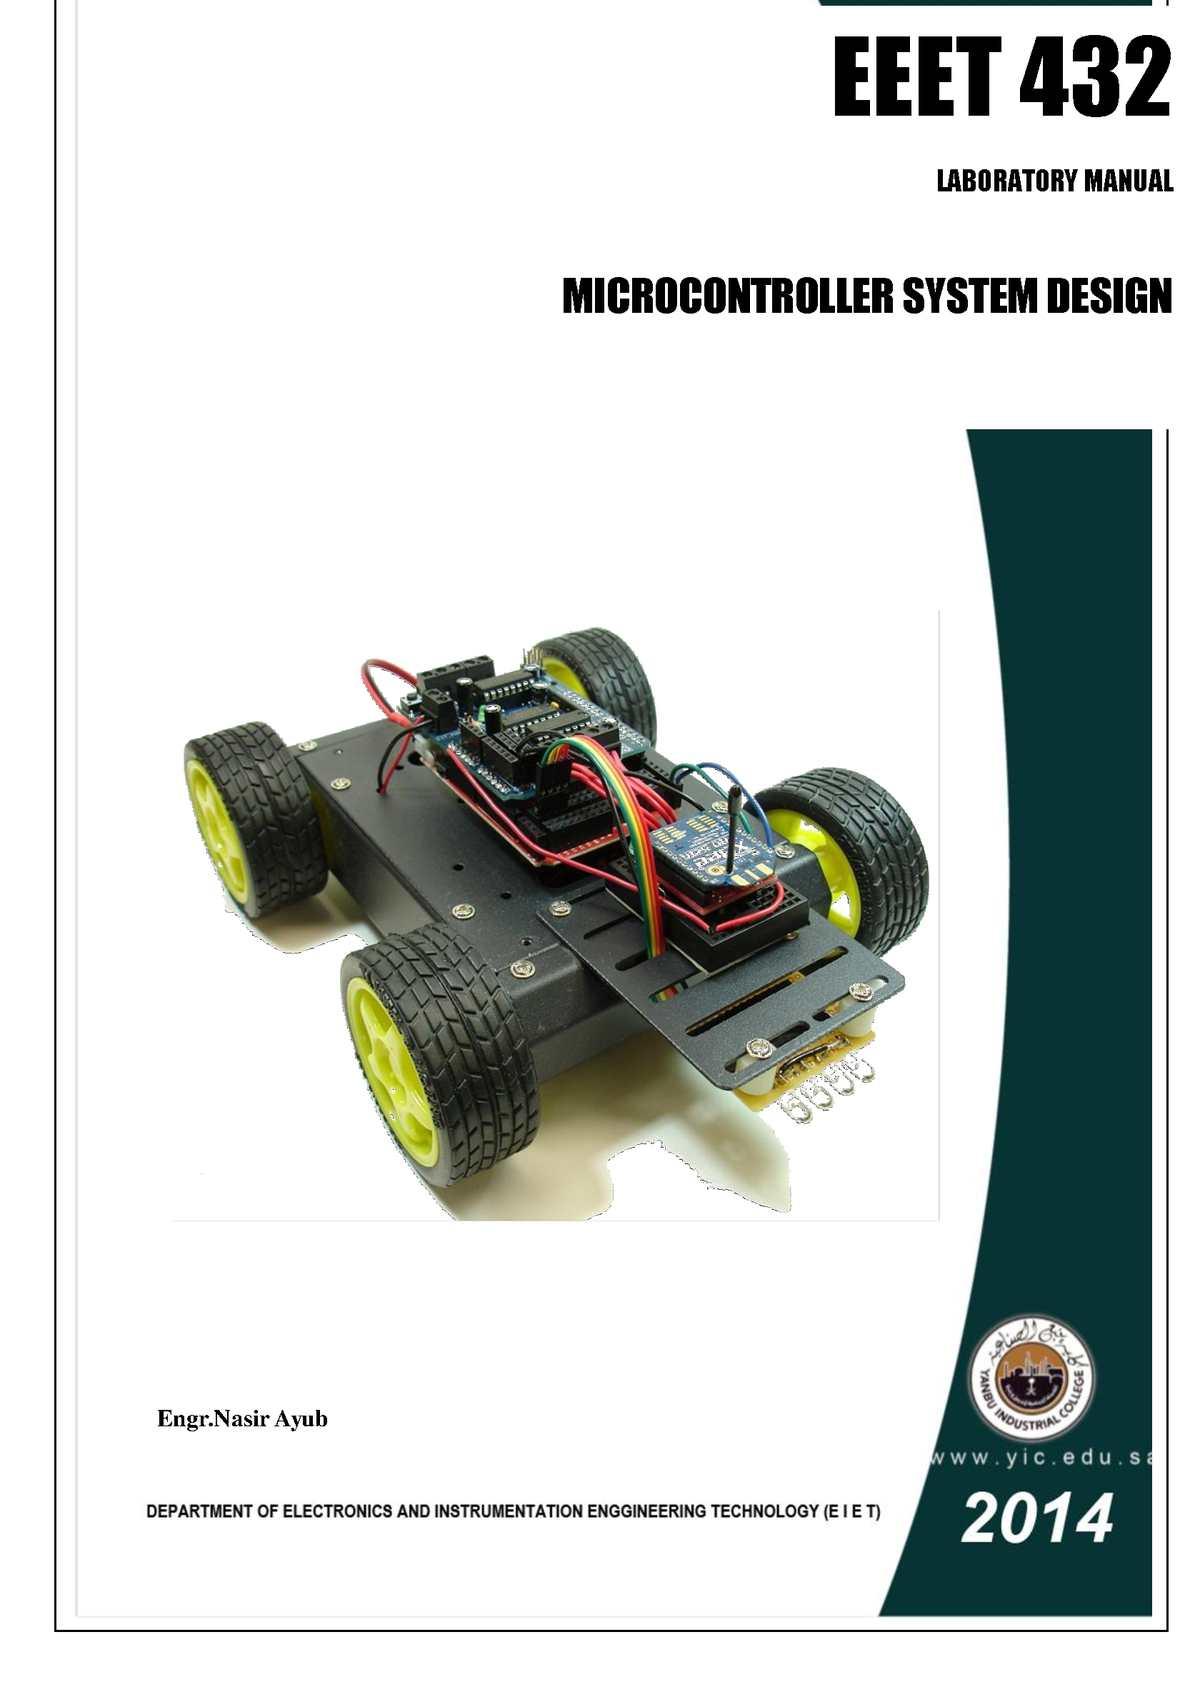 Calameo Microcontroller System Design Lab Manual